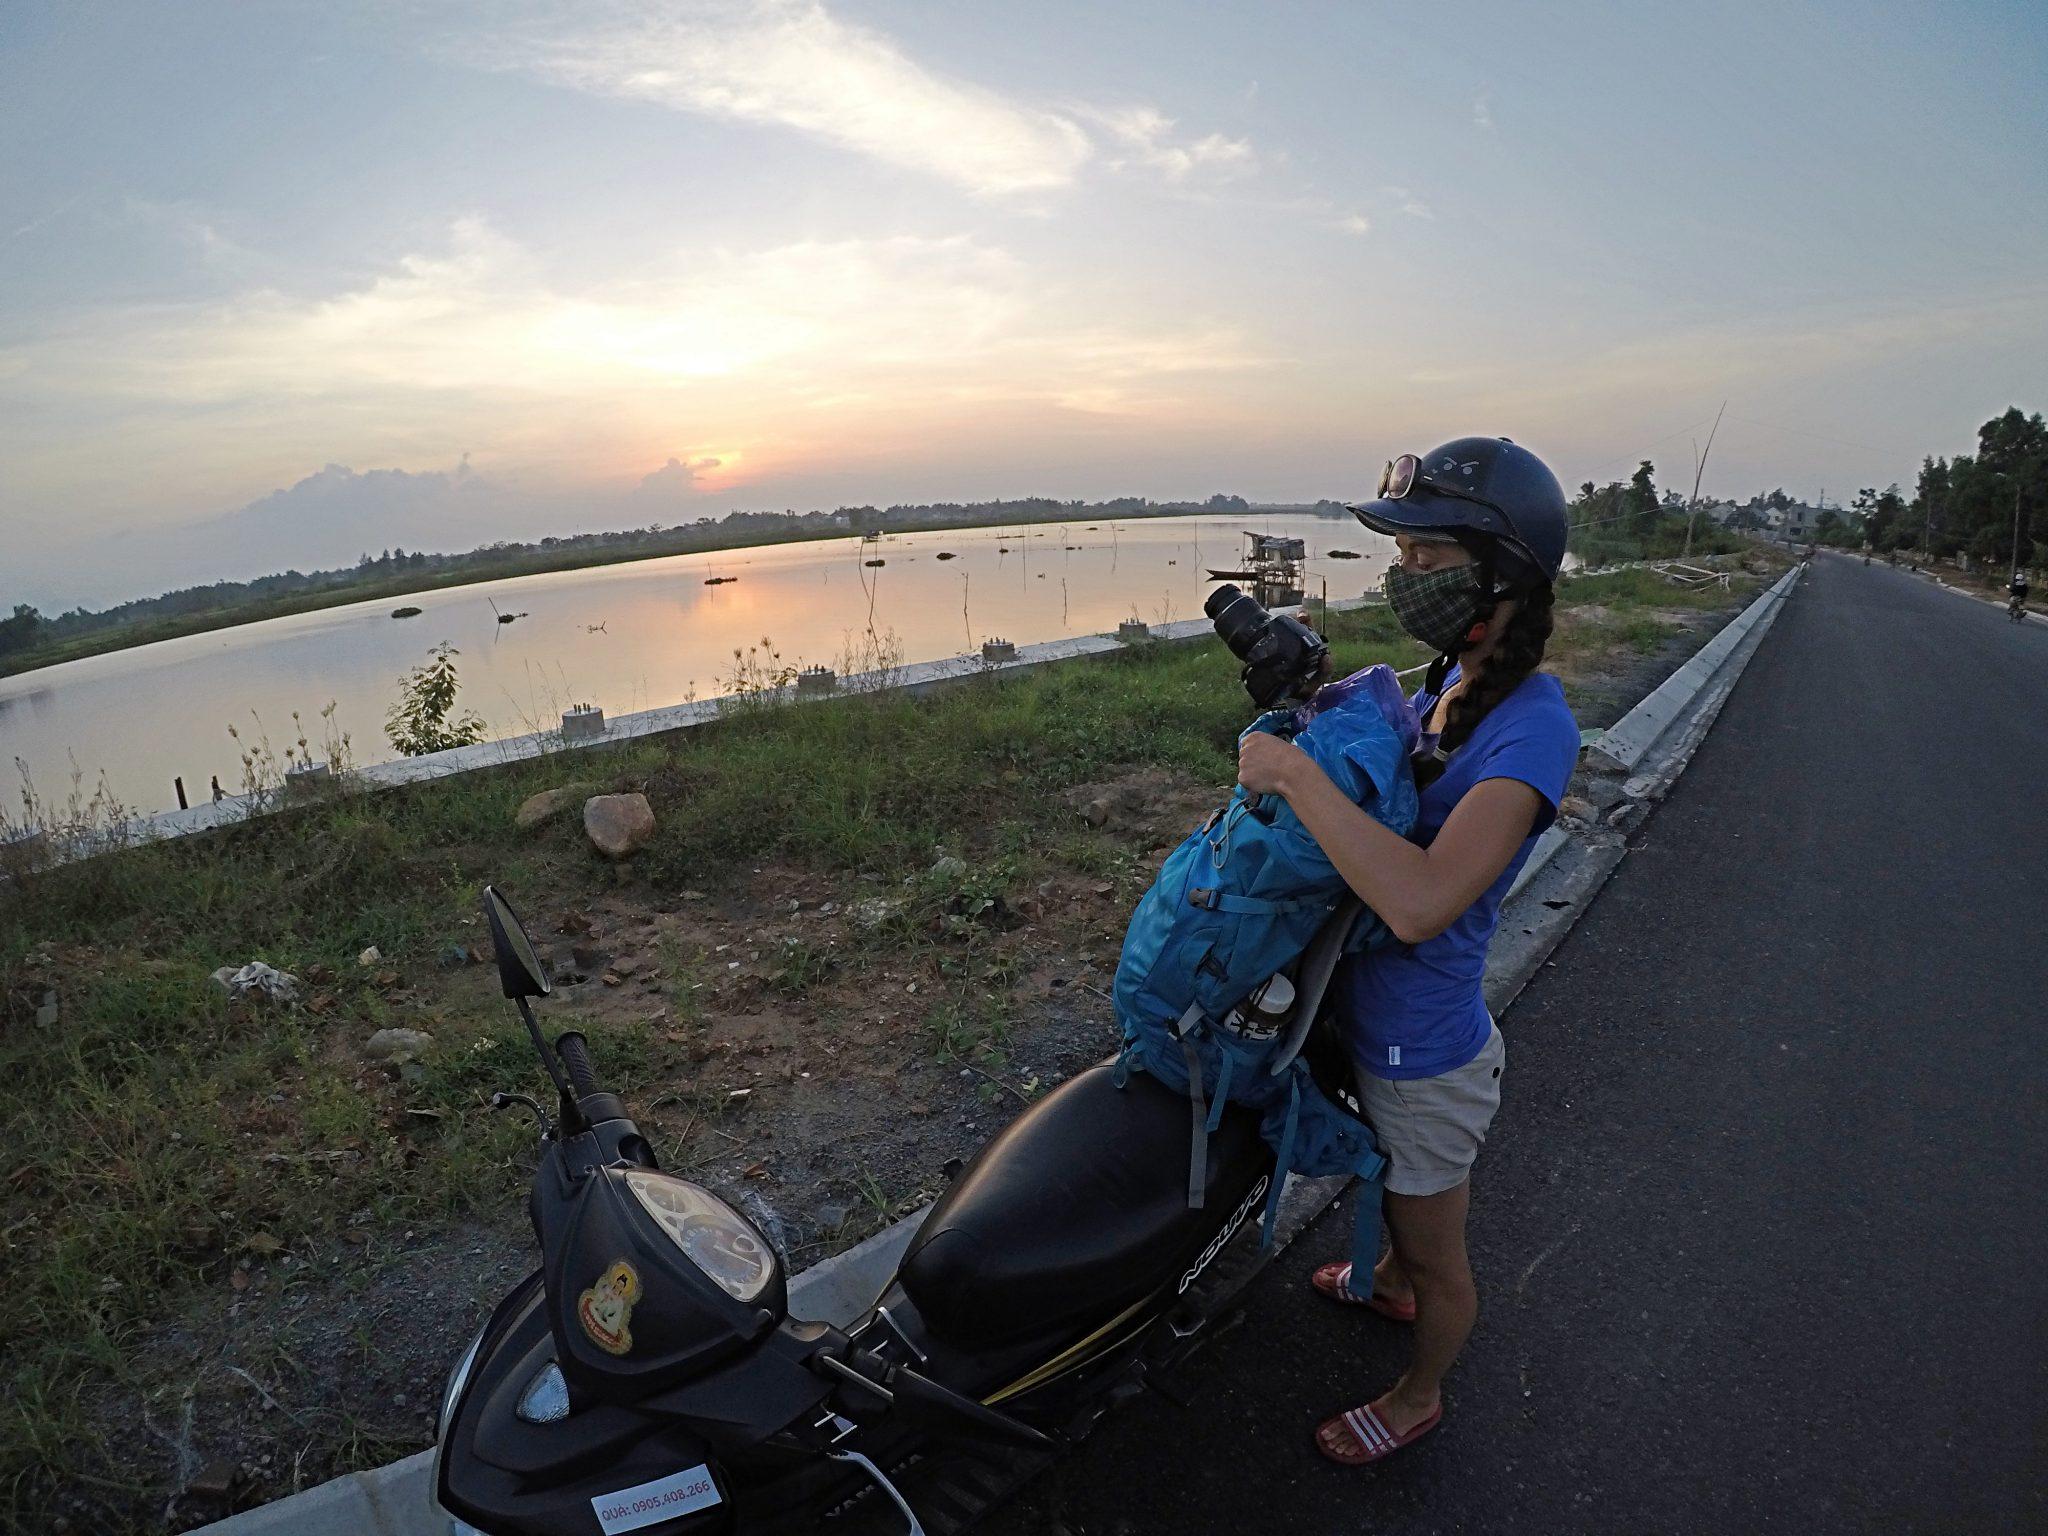 vietnam motorka doprava cestovanie